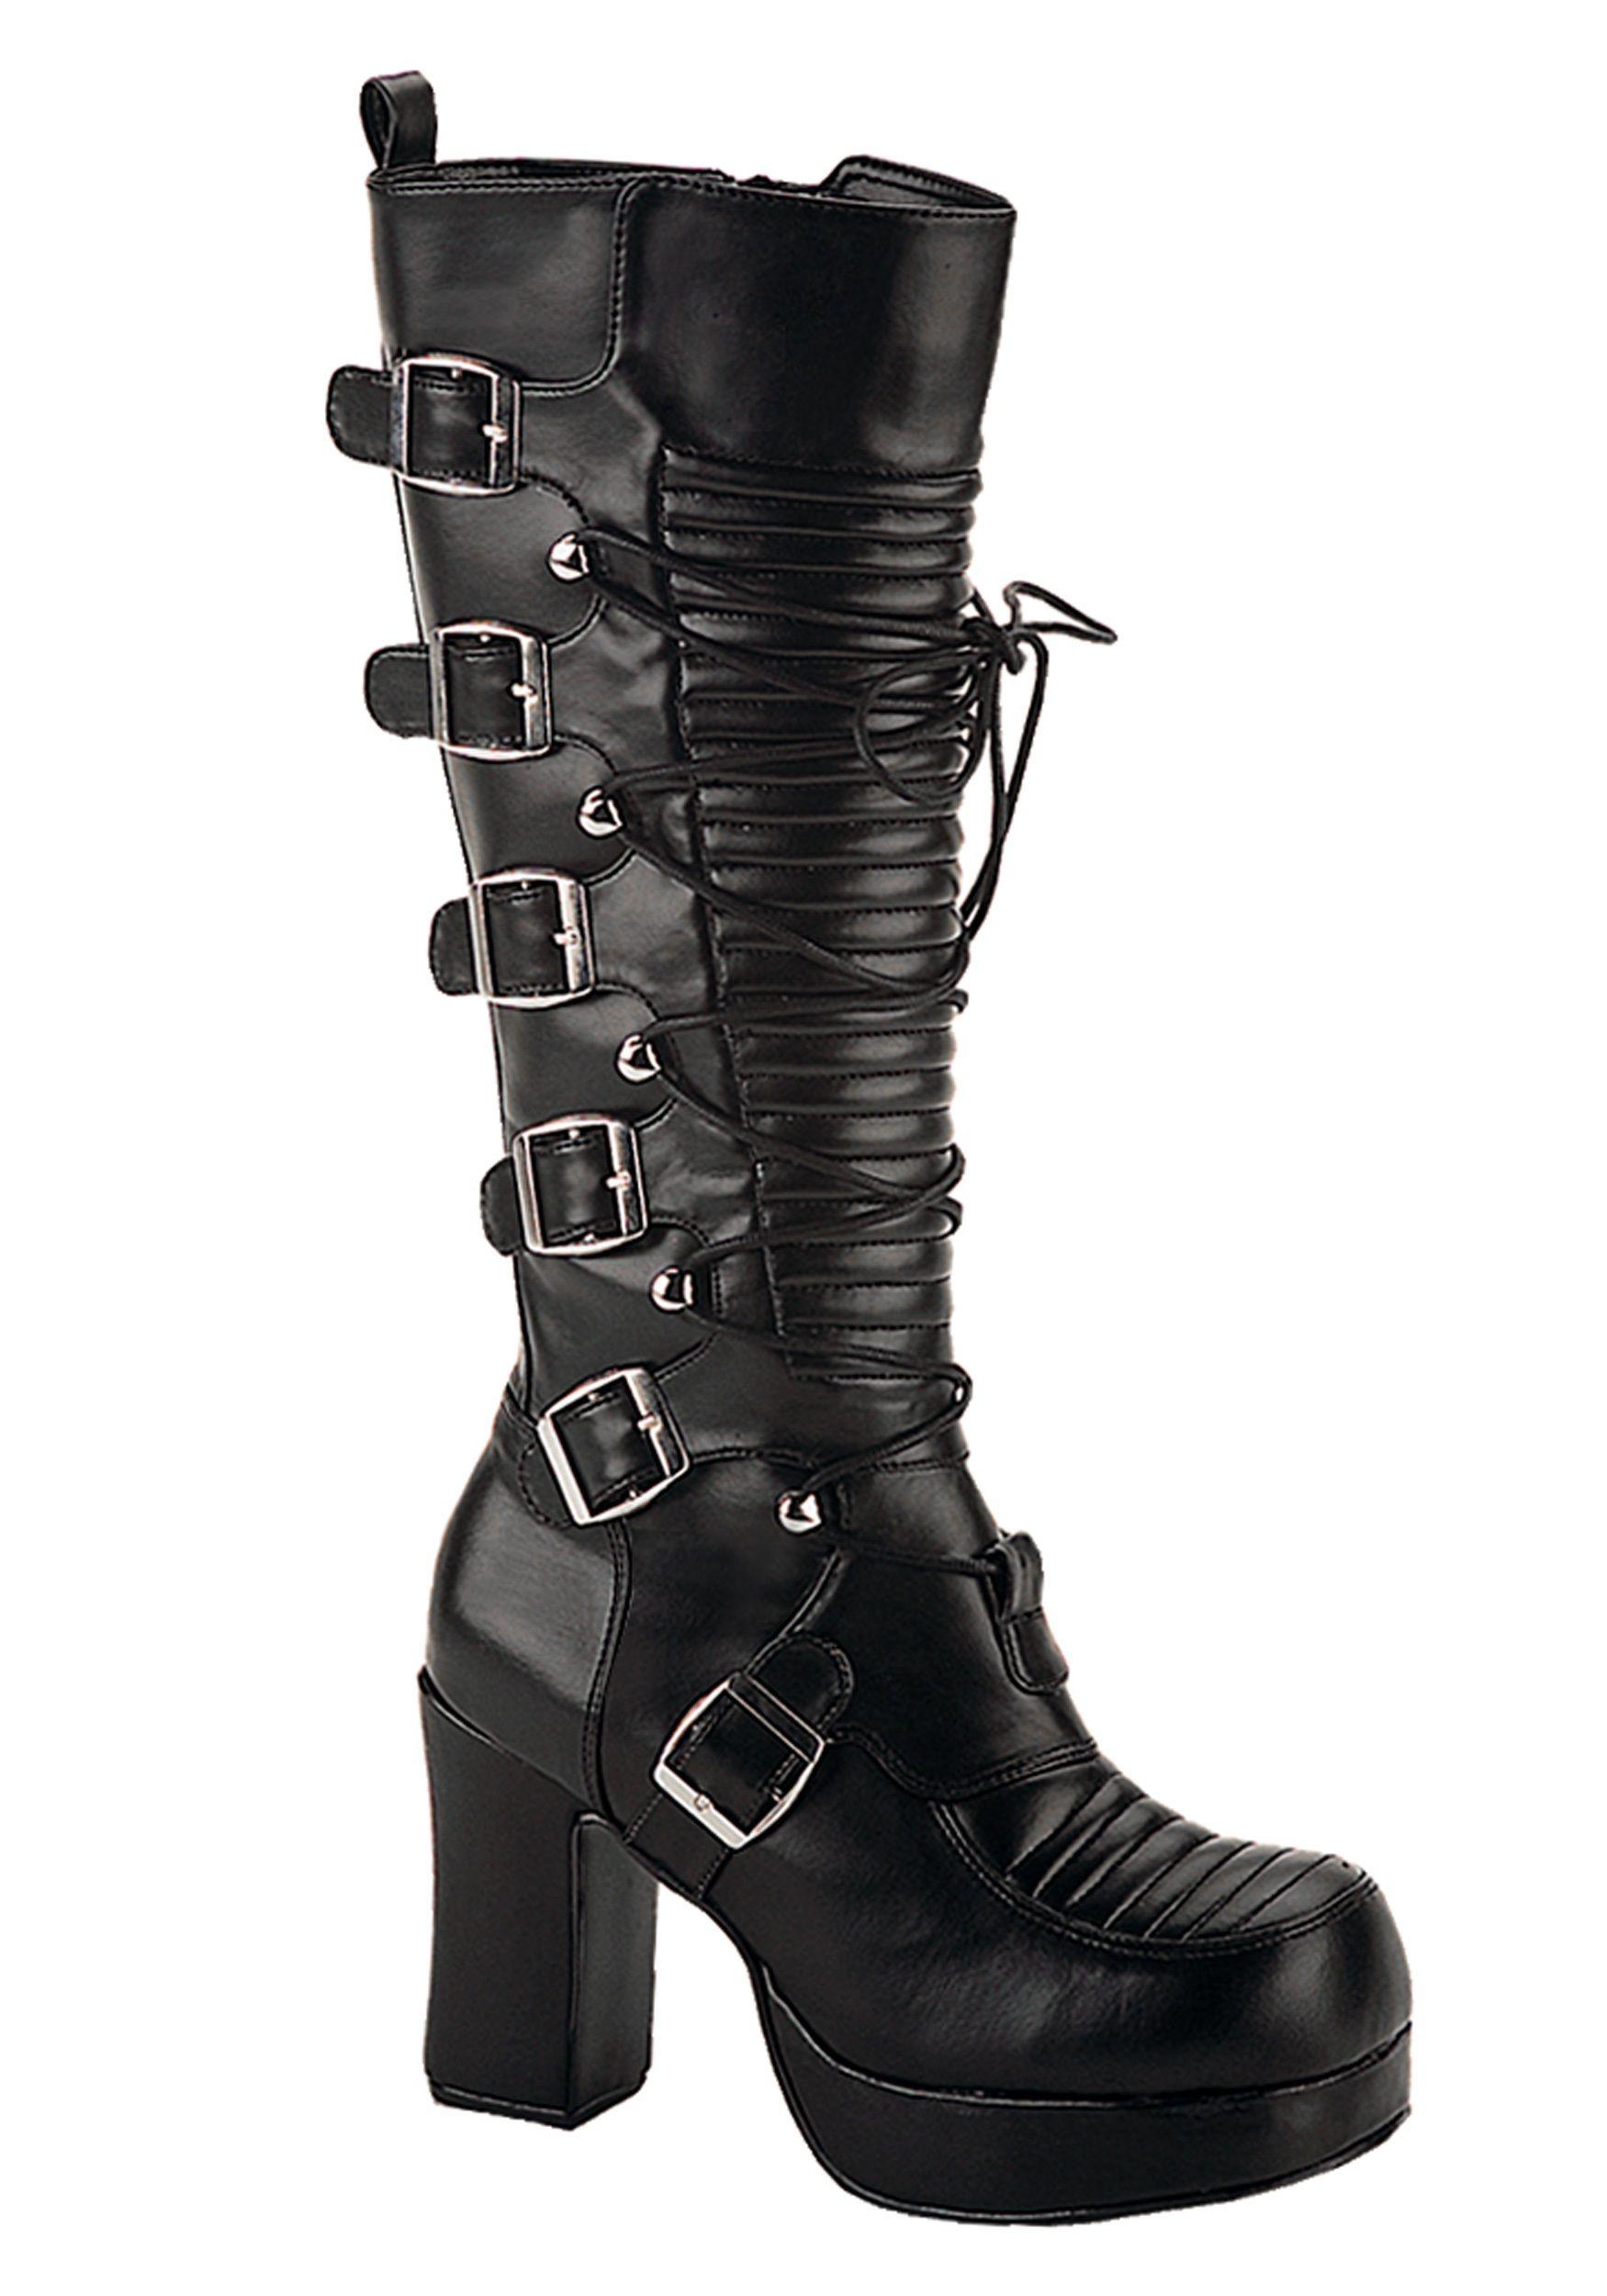 Demonia CRYPTO-106 4 Inch Heel P/F Goth Punk Lolita Corseted 5 Buckle Knee BT vT9aKnM